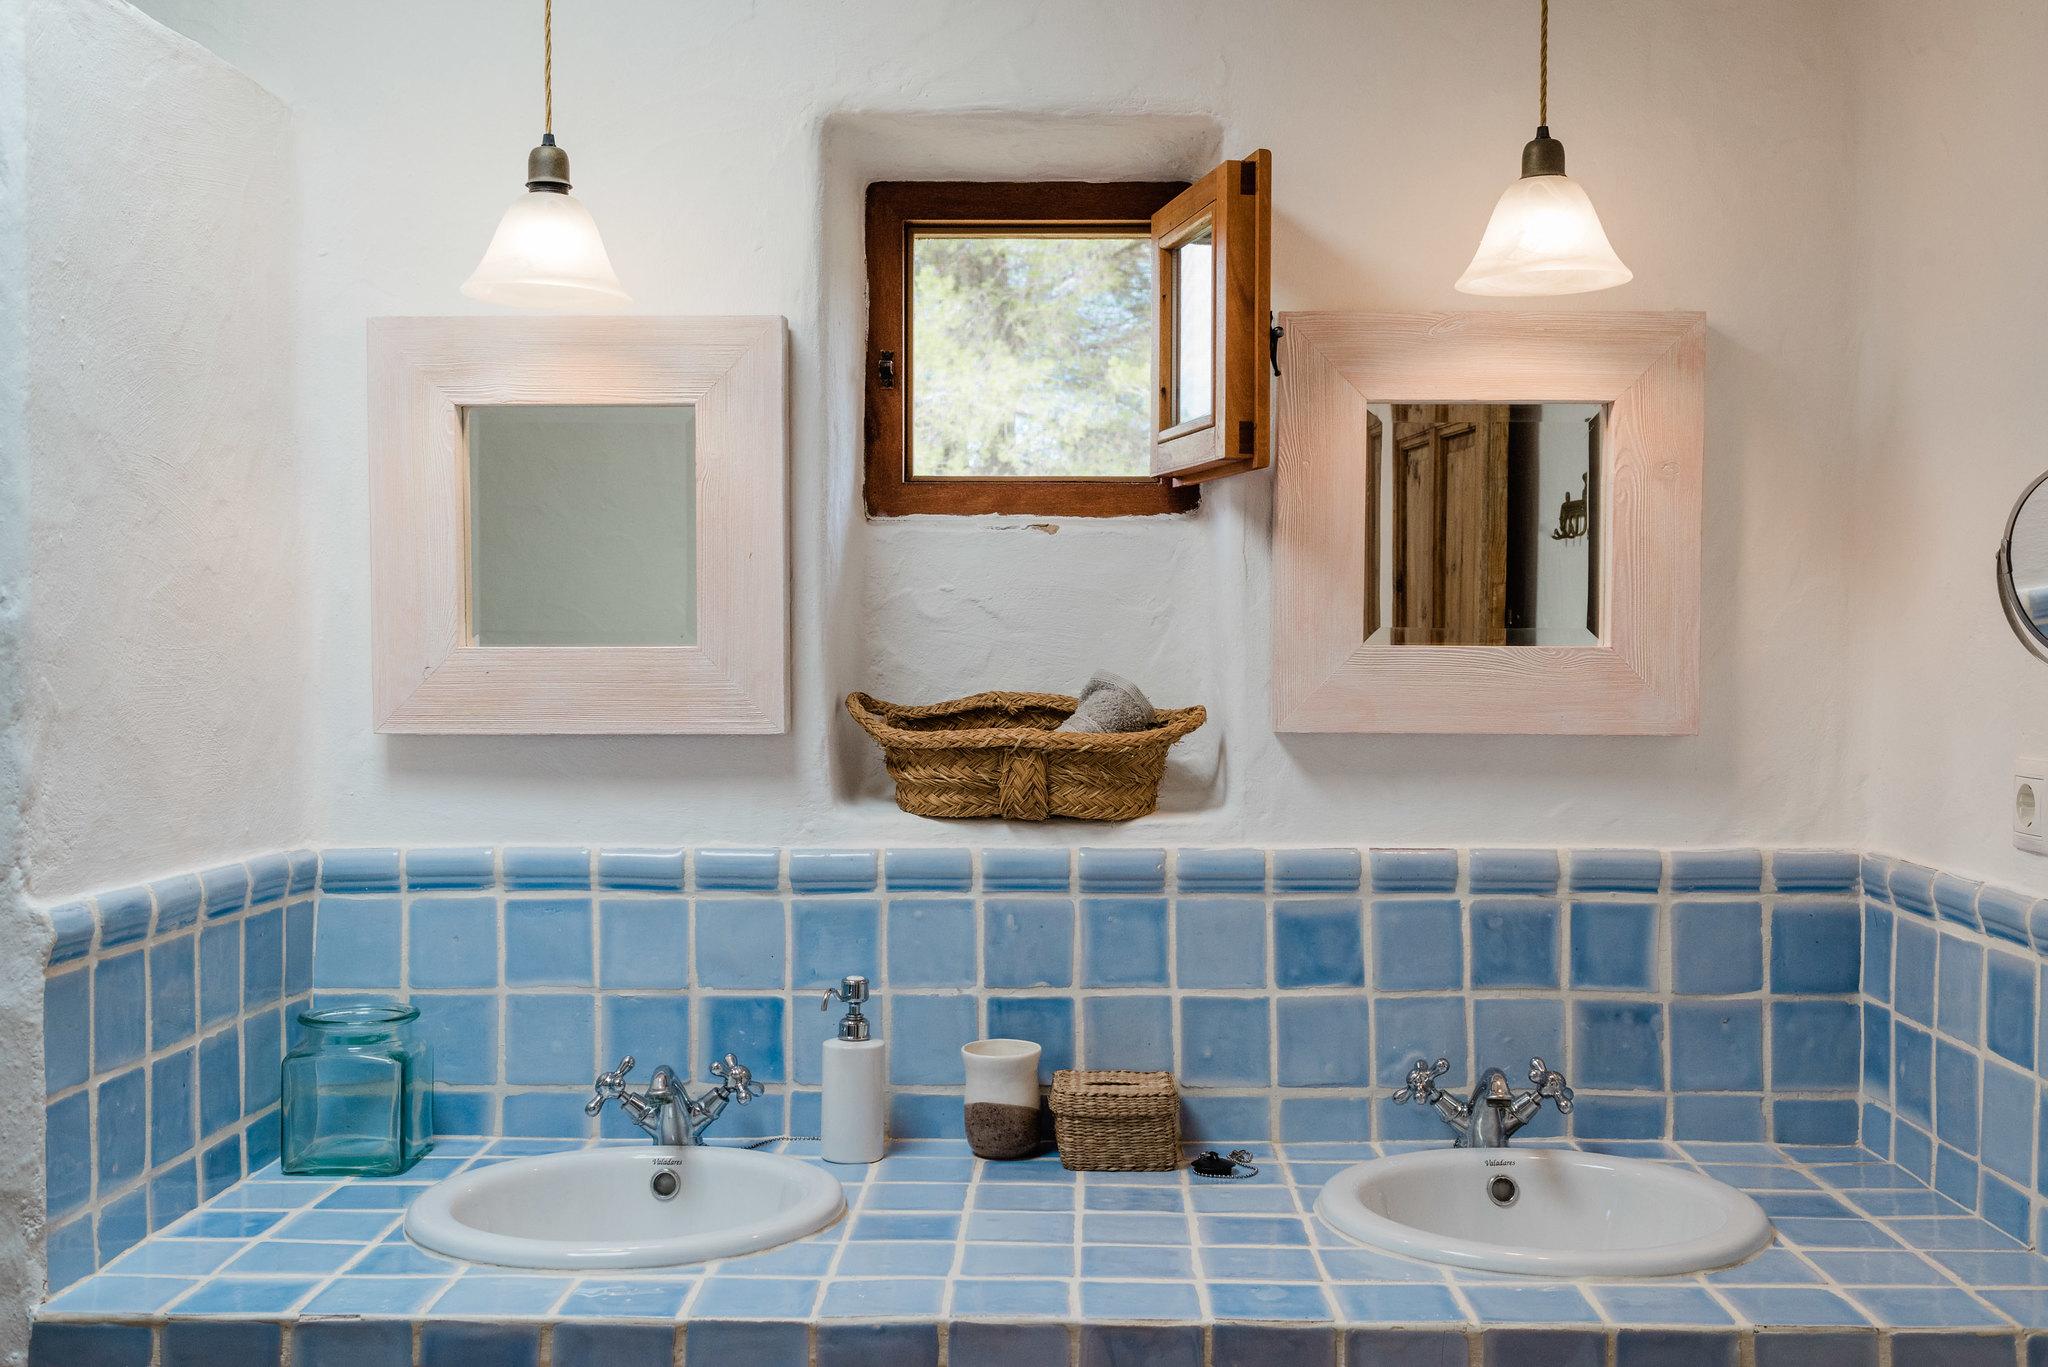 https://www.white-ibiza.com/wp-content/uploads/2020/05/white-ibiza-villas-can-sabina-interior-bathroom2.jpg